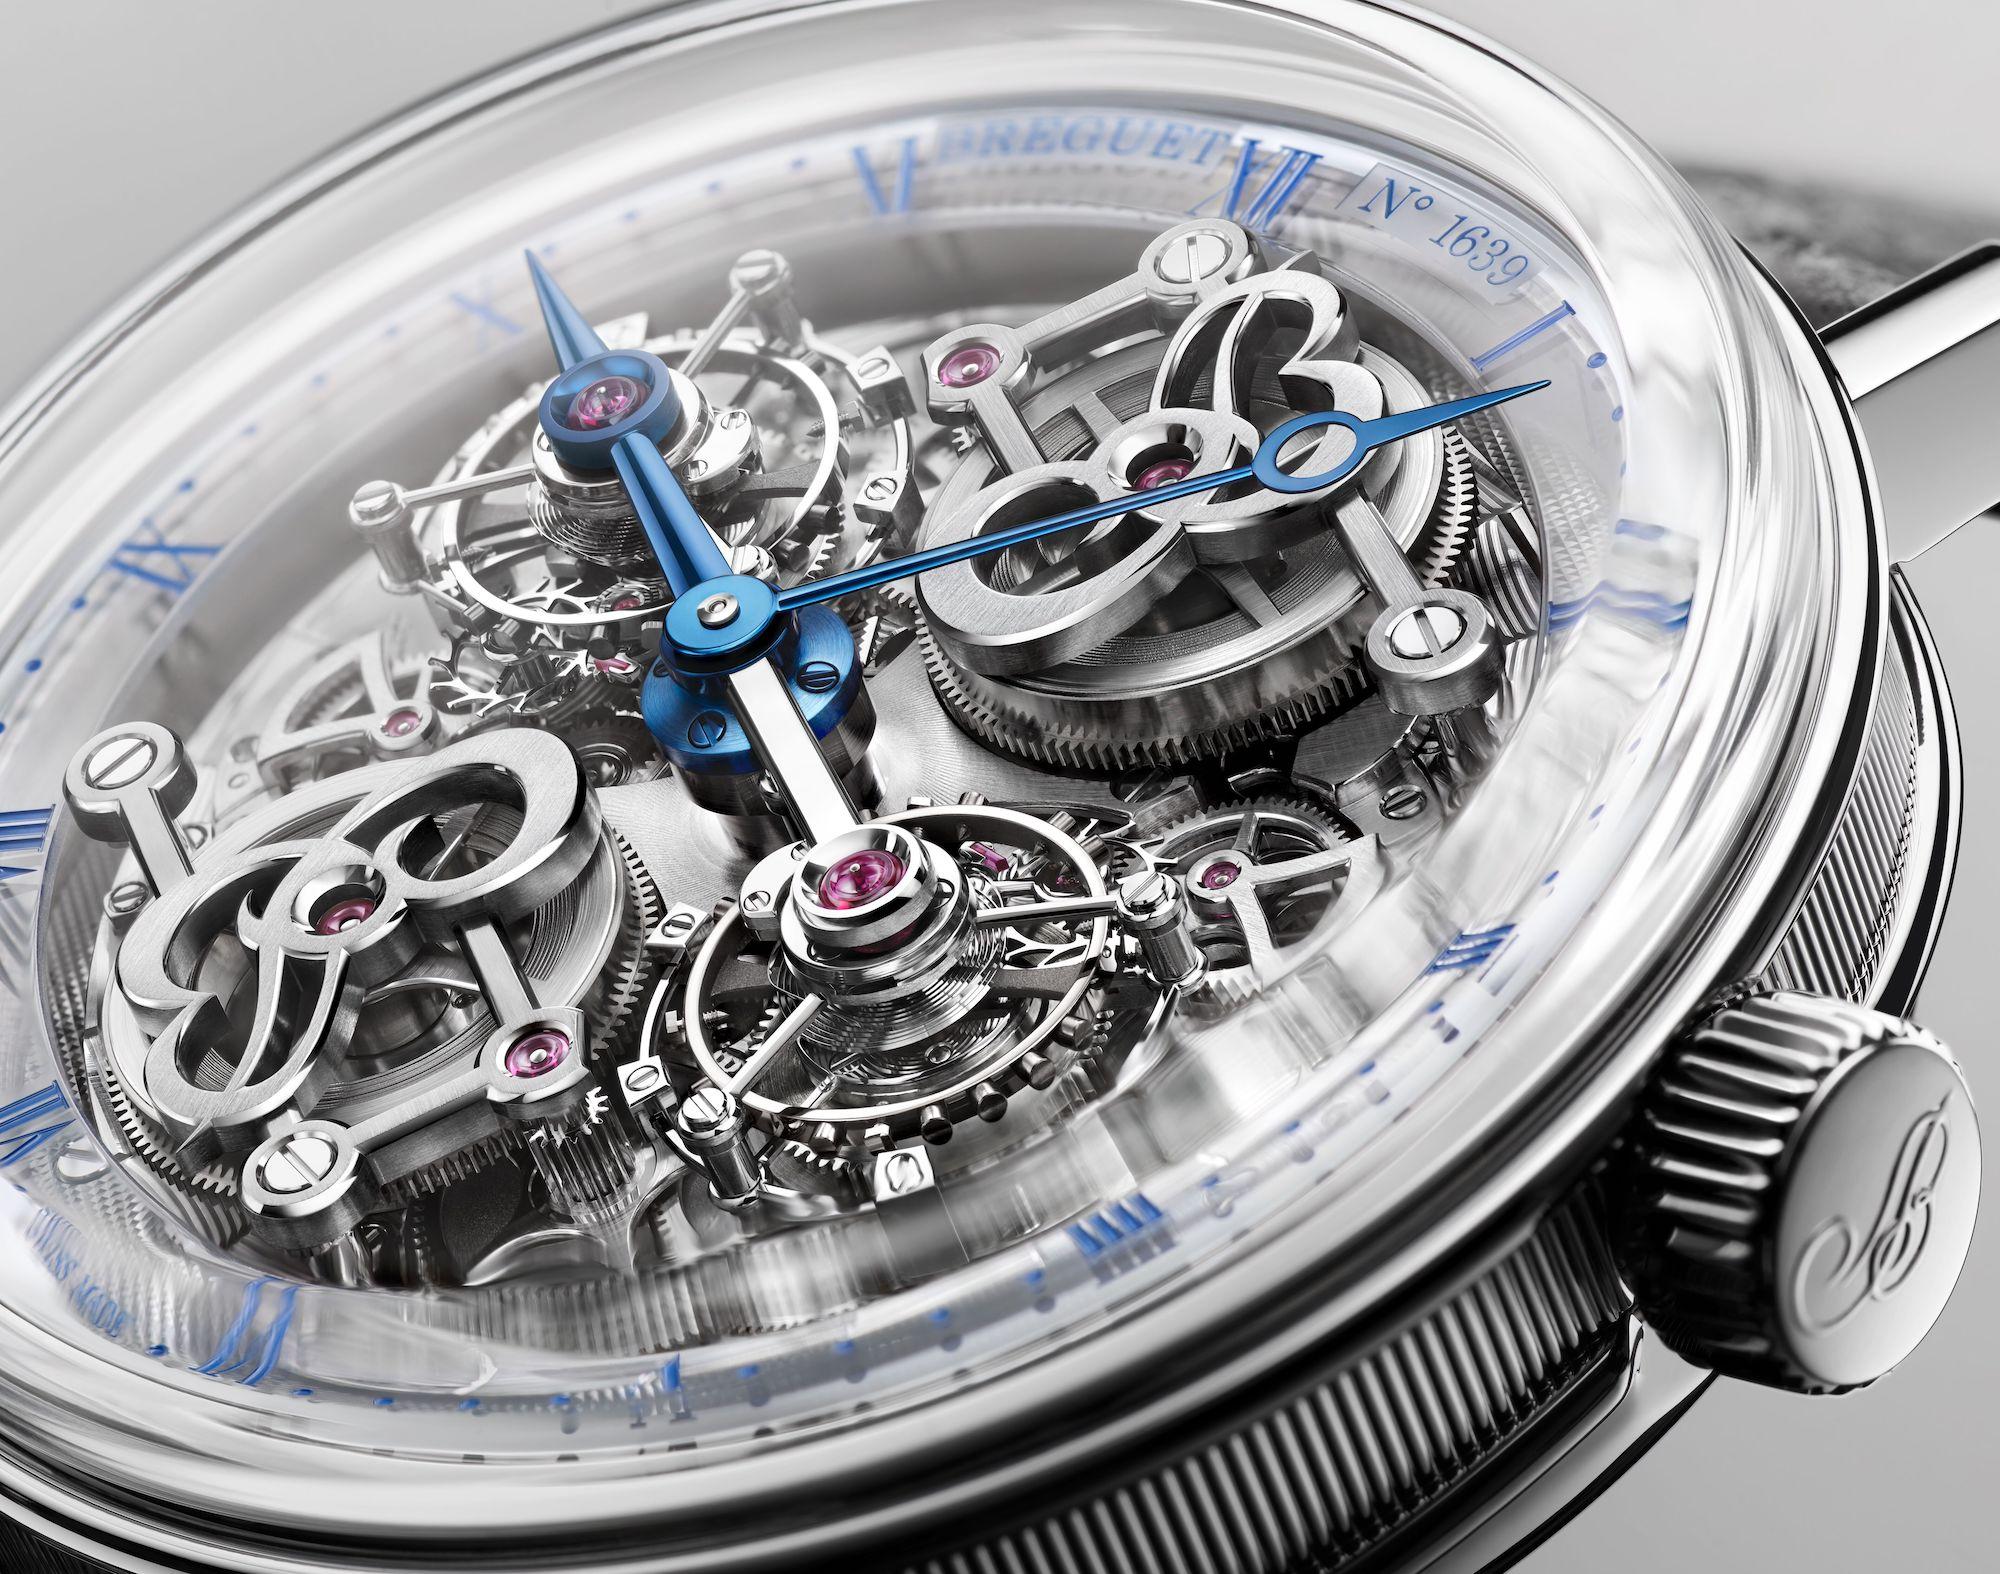 Breguet Classique Double Tourbillon Quai de l'Horloge 5345 detalle 3